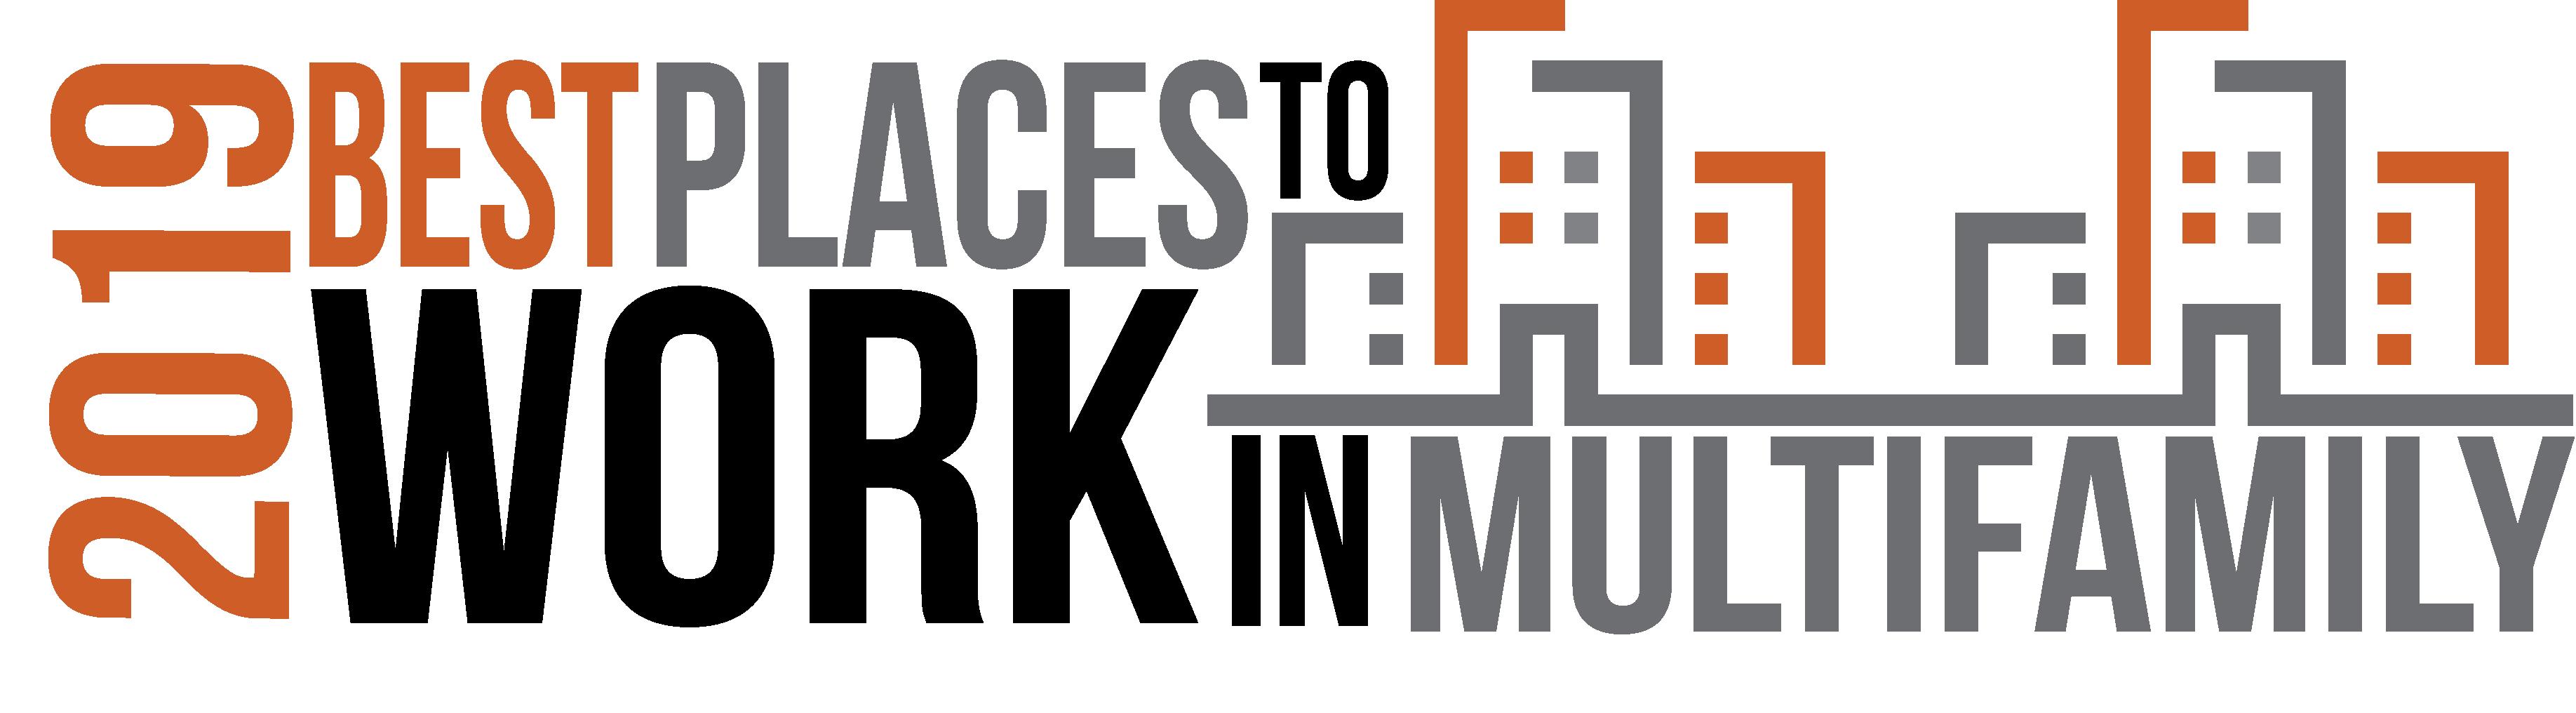 2019-bpw-logo-1